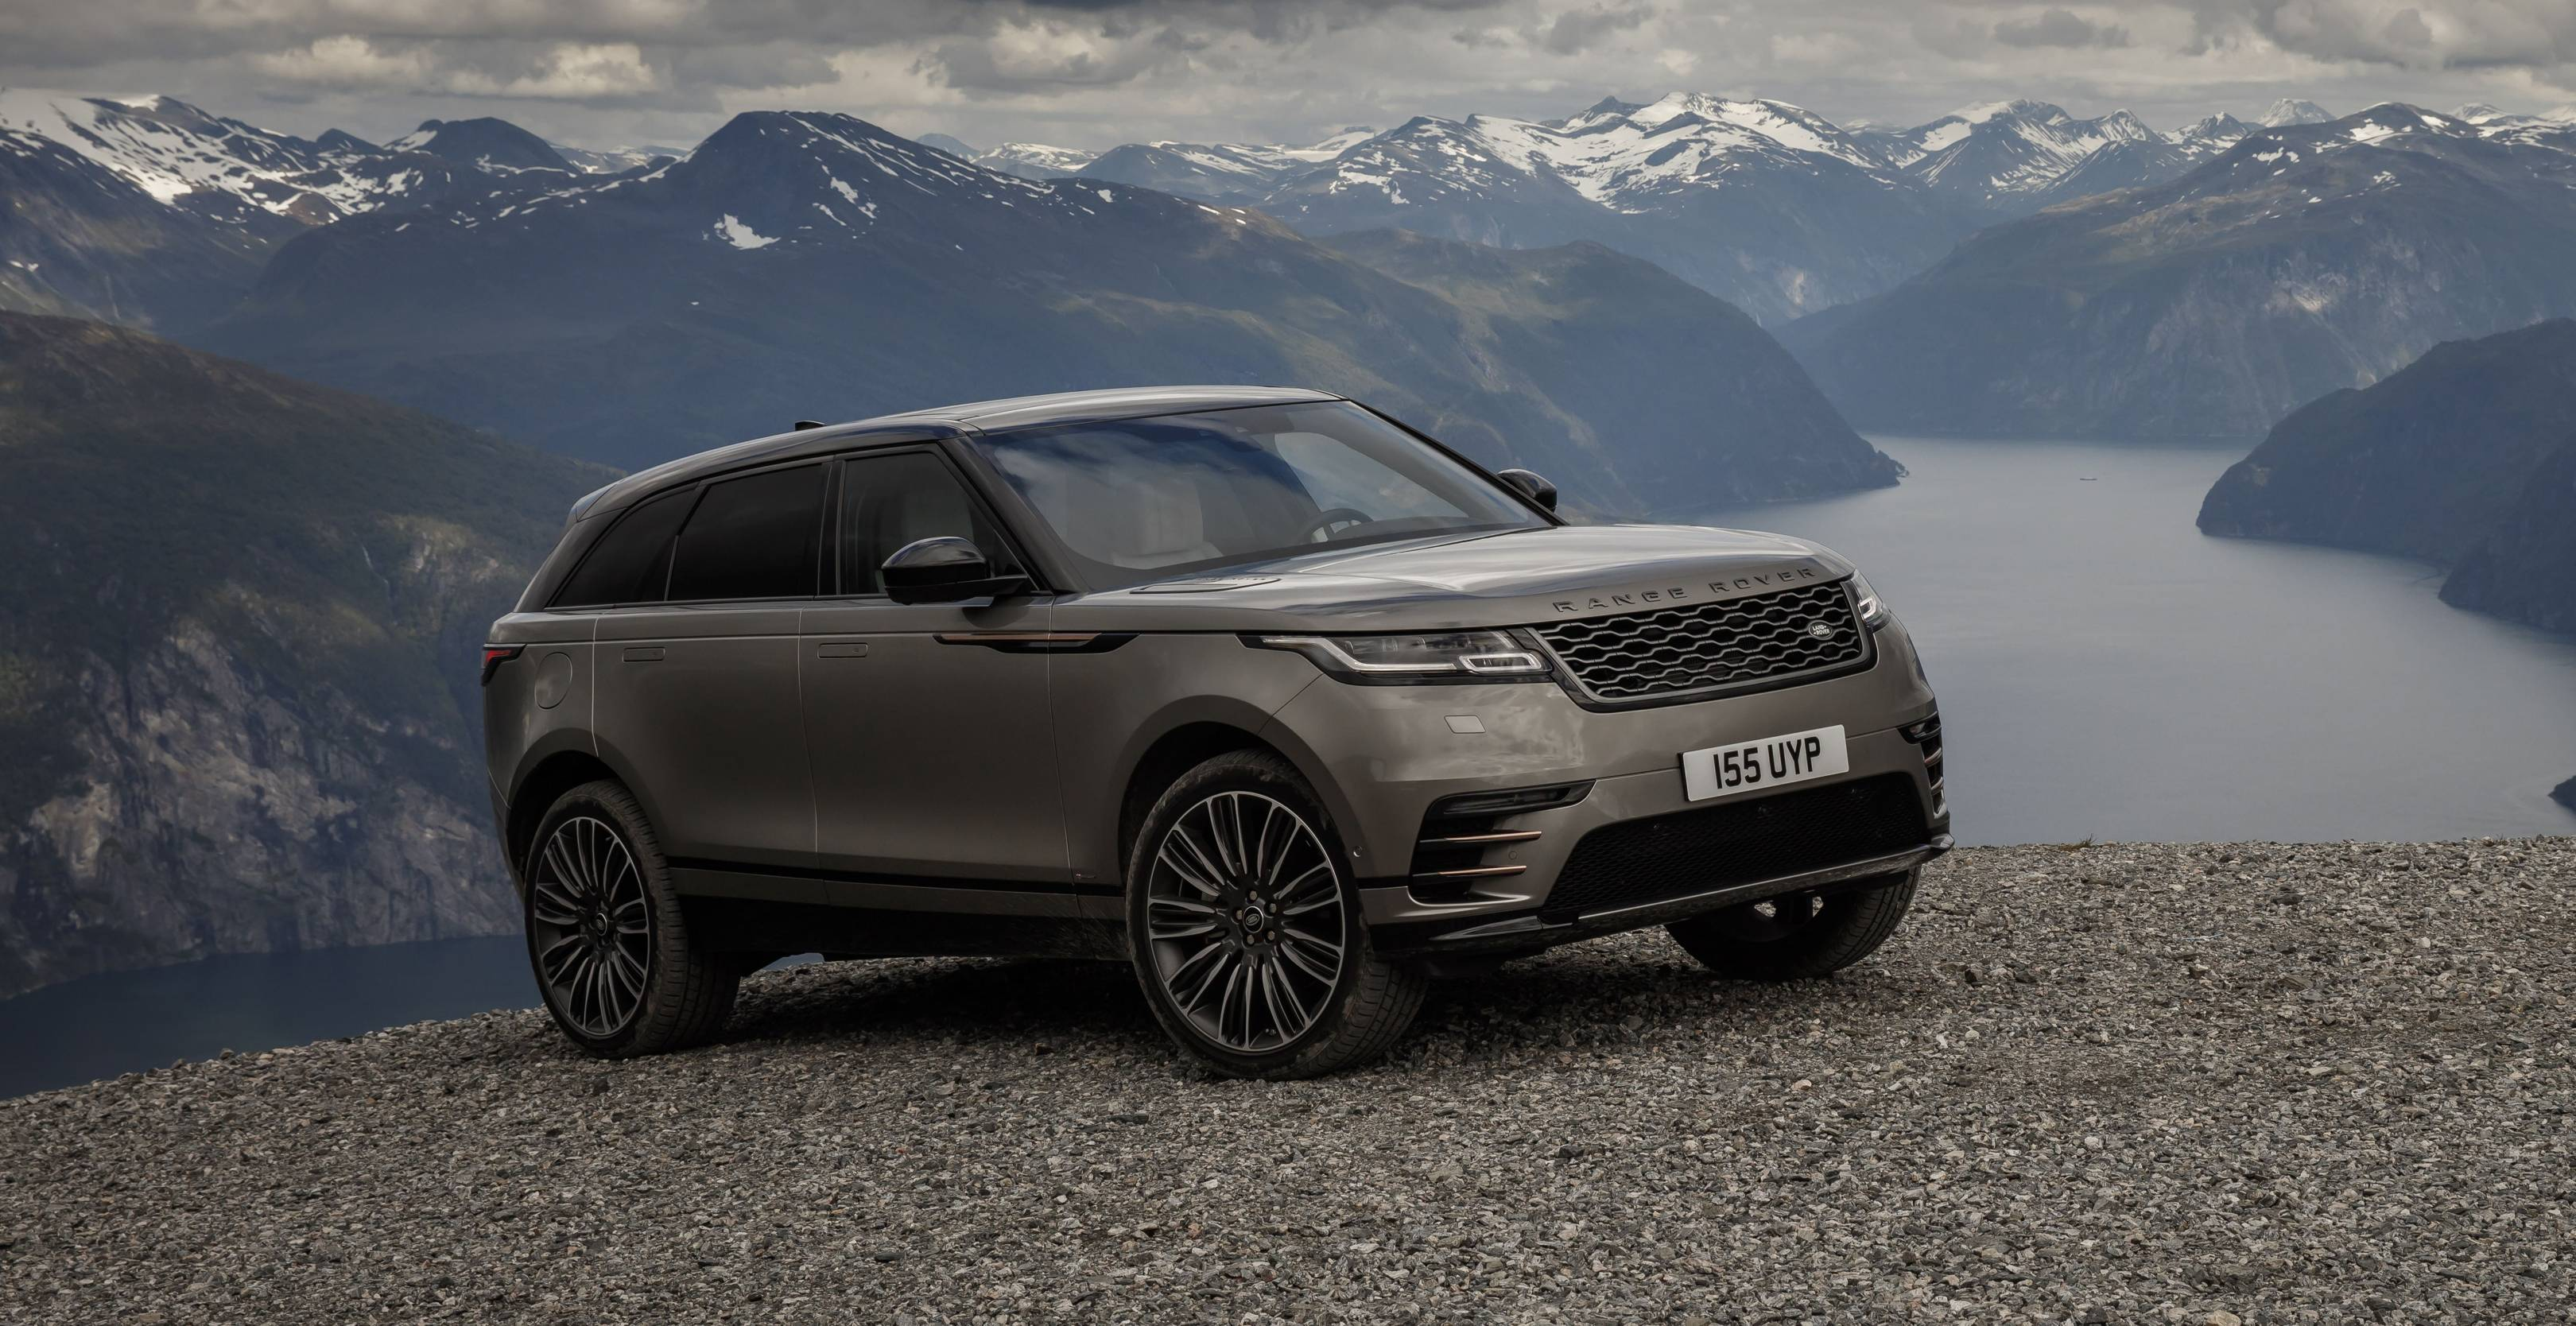 New Range Rover Velar review A huge success despite some niggles